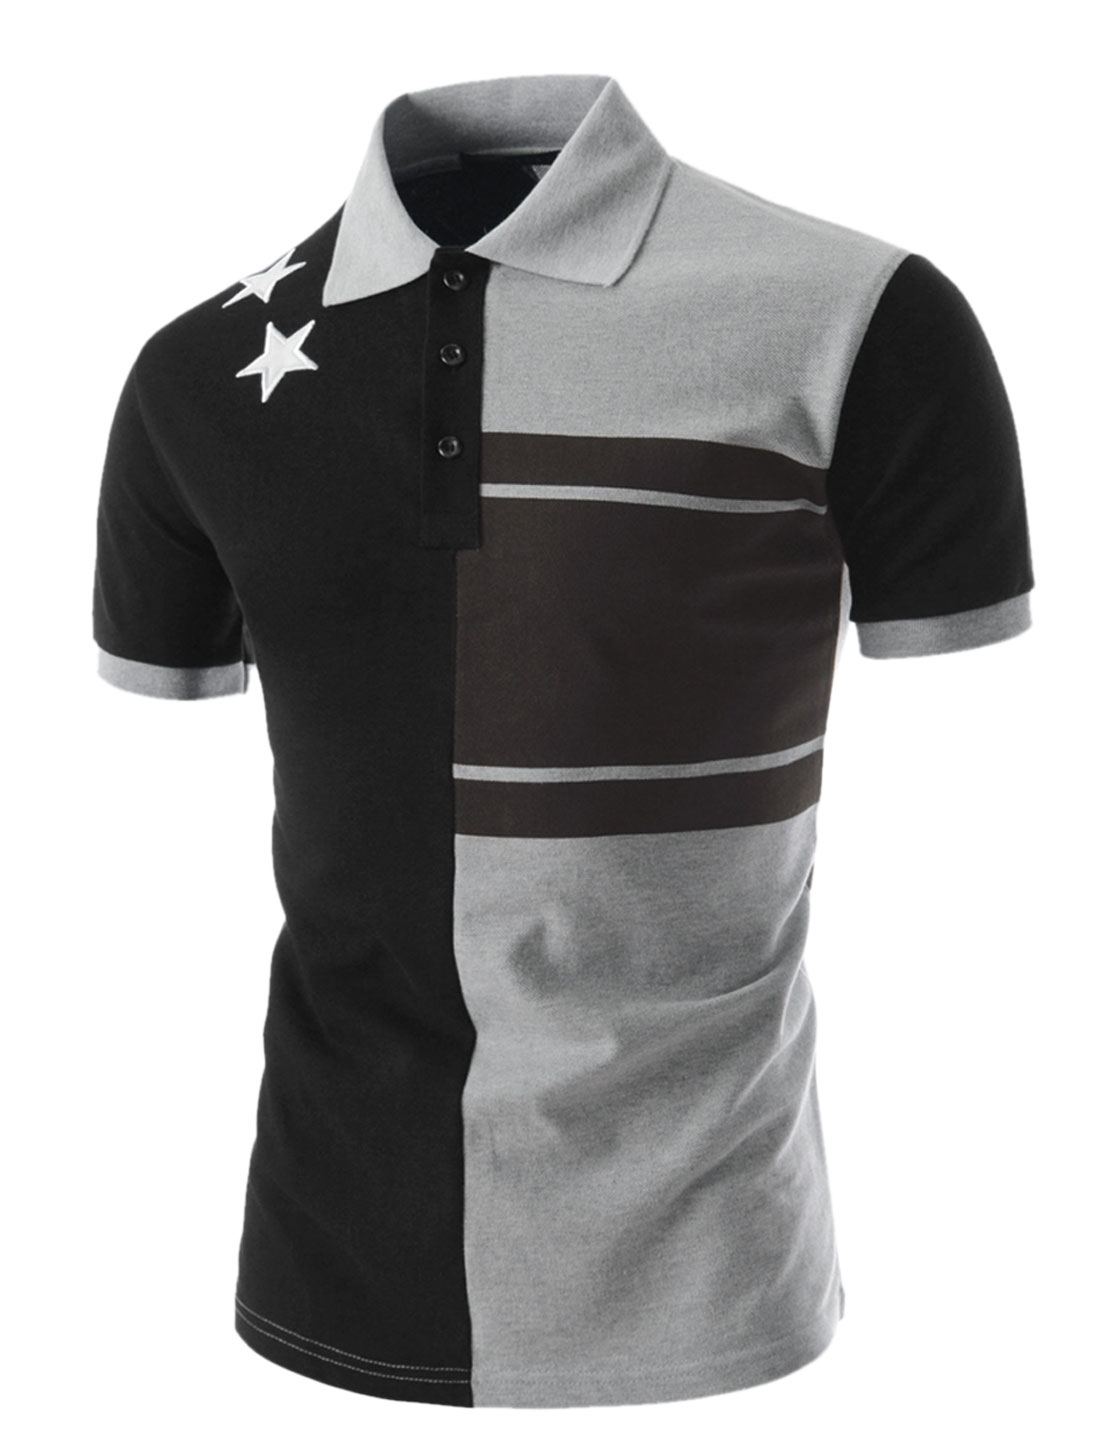 Men Stars Stitched Detail Color Block Polo Shirt Black Dark Gray M